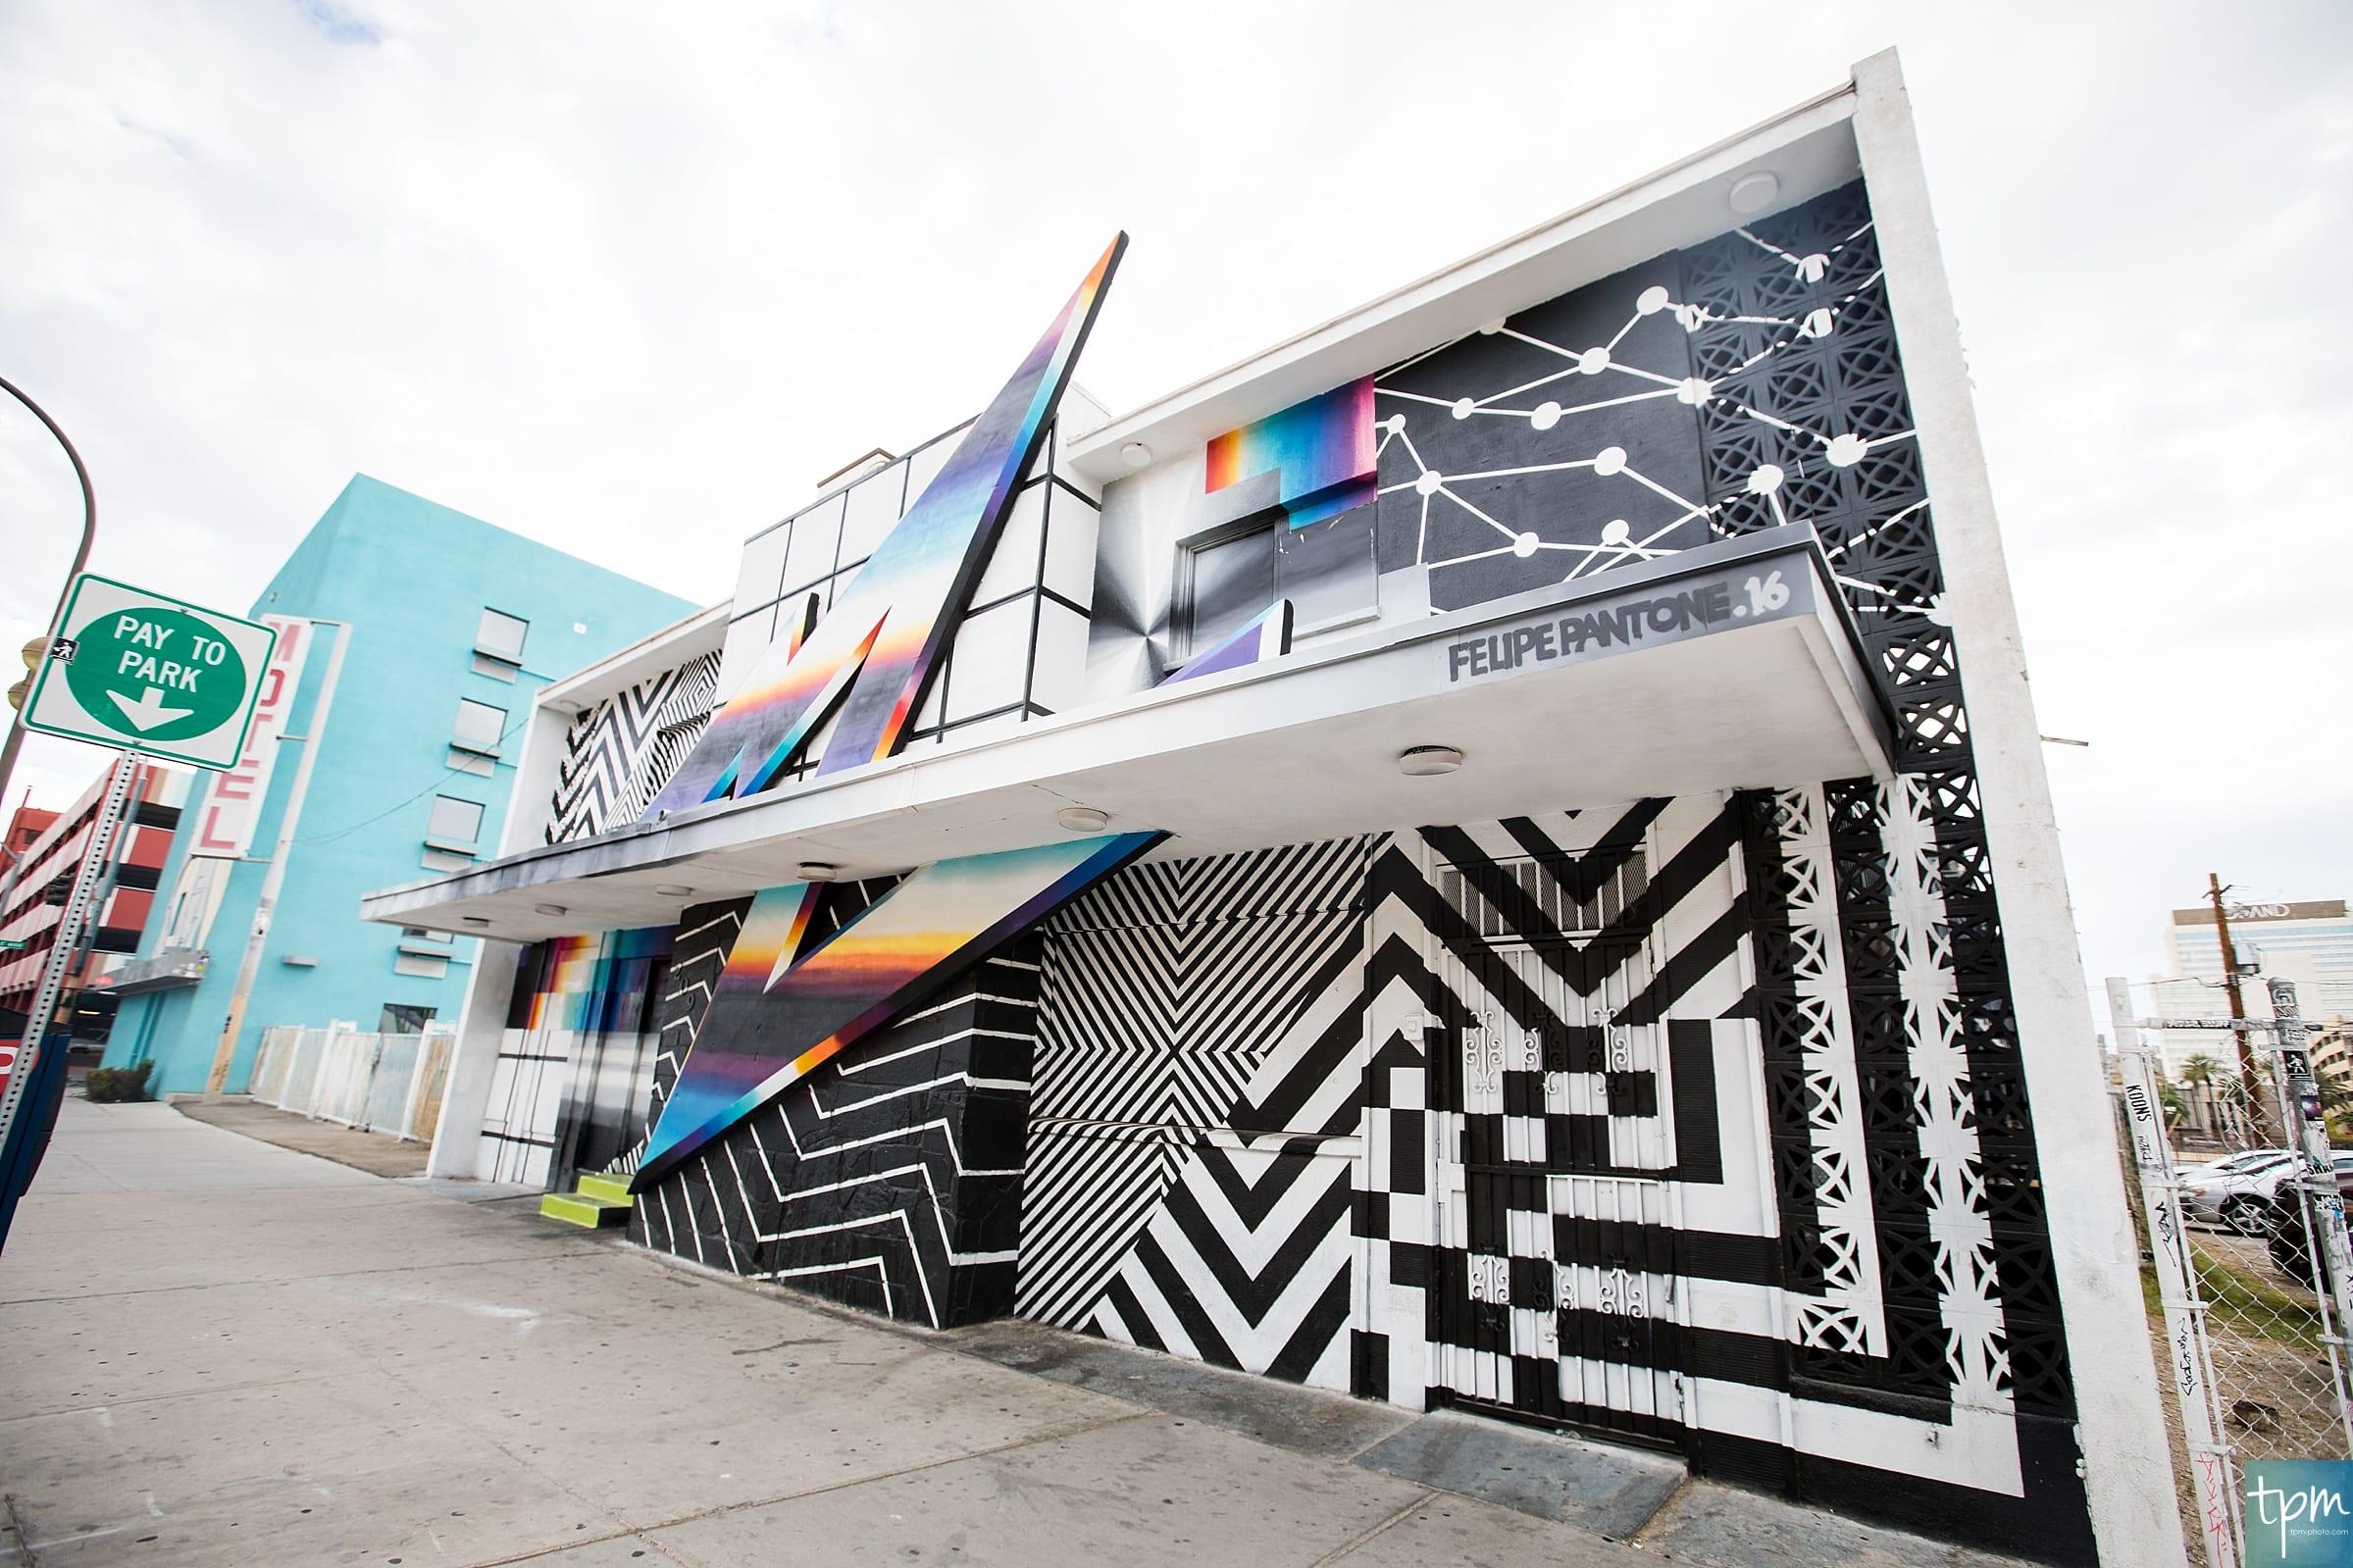 Felipe Pantone, 7th Street, Taylored Photo Memories, Las Vegas Murals